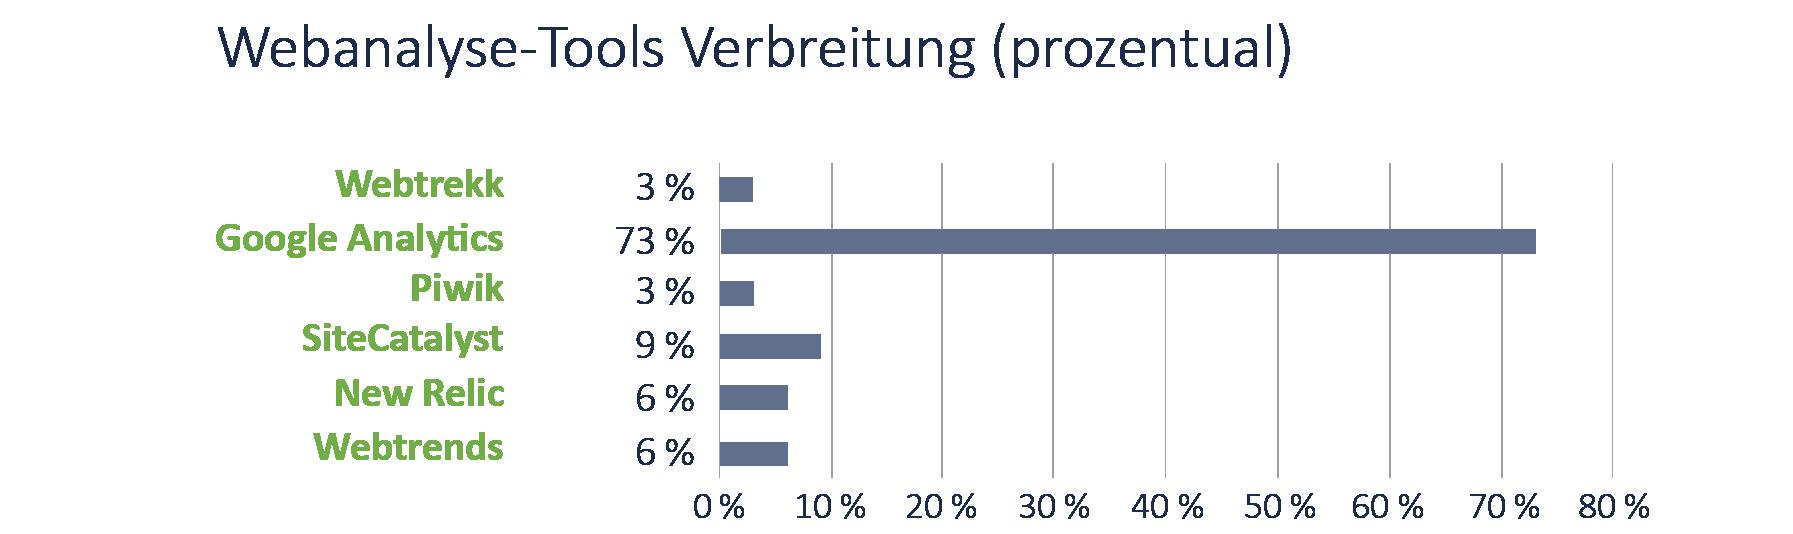 Aufgesang_IM_Studie_2018_Diagramm_S27_Webanalyse-Tools Verbreitung (prozentual)